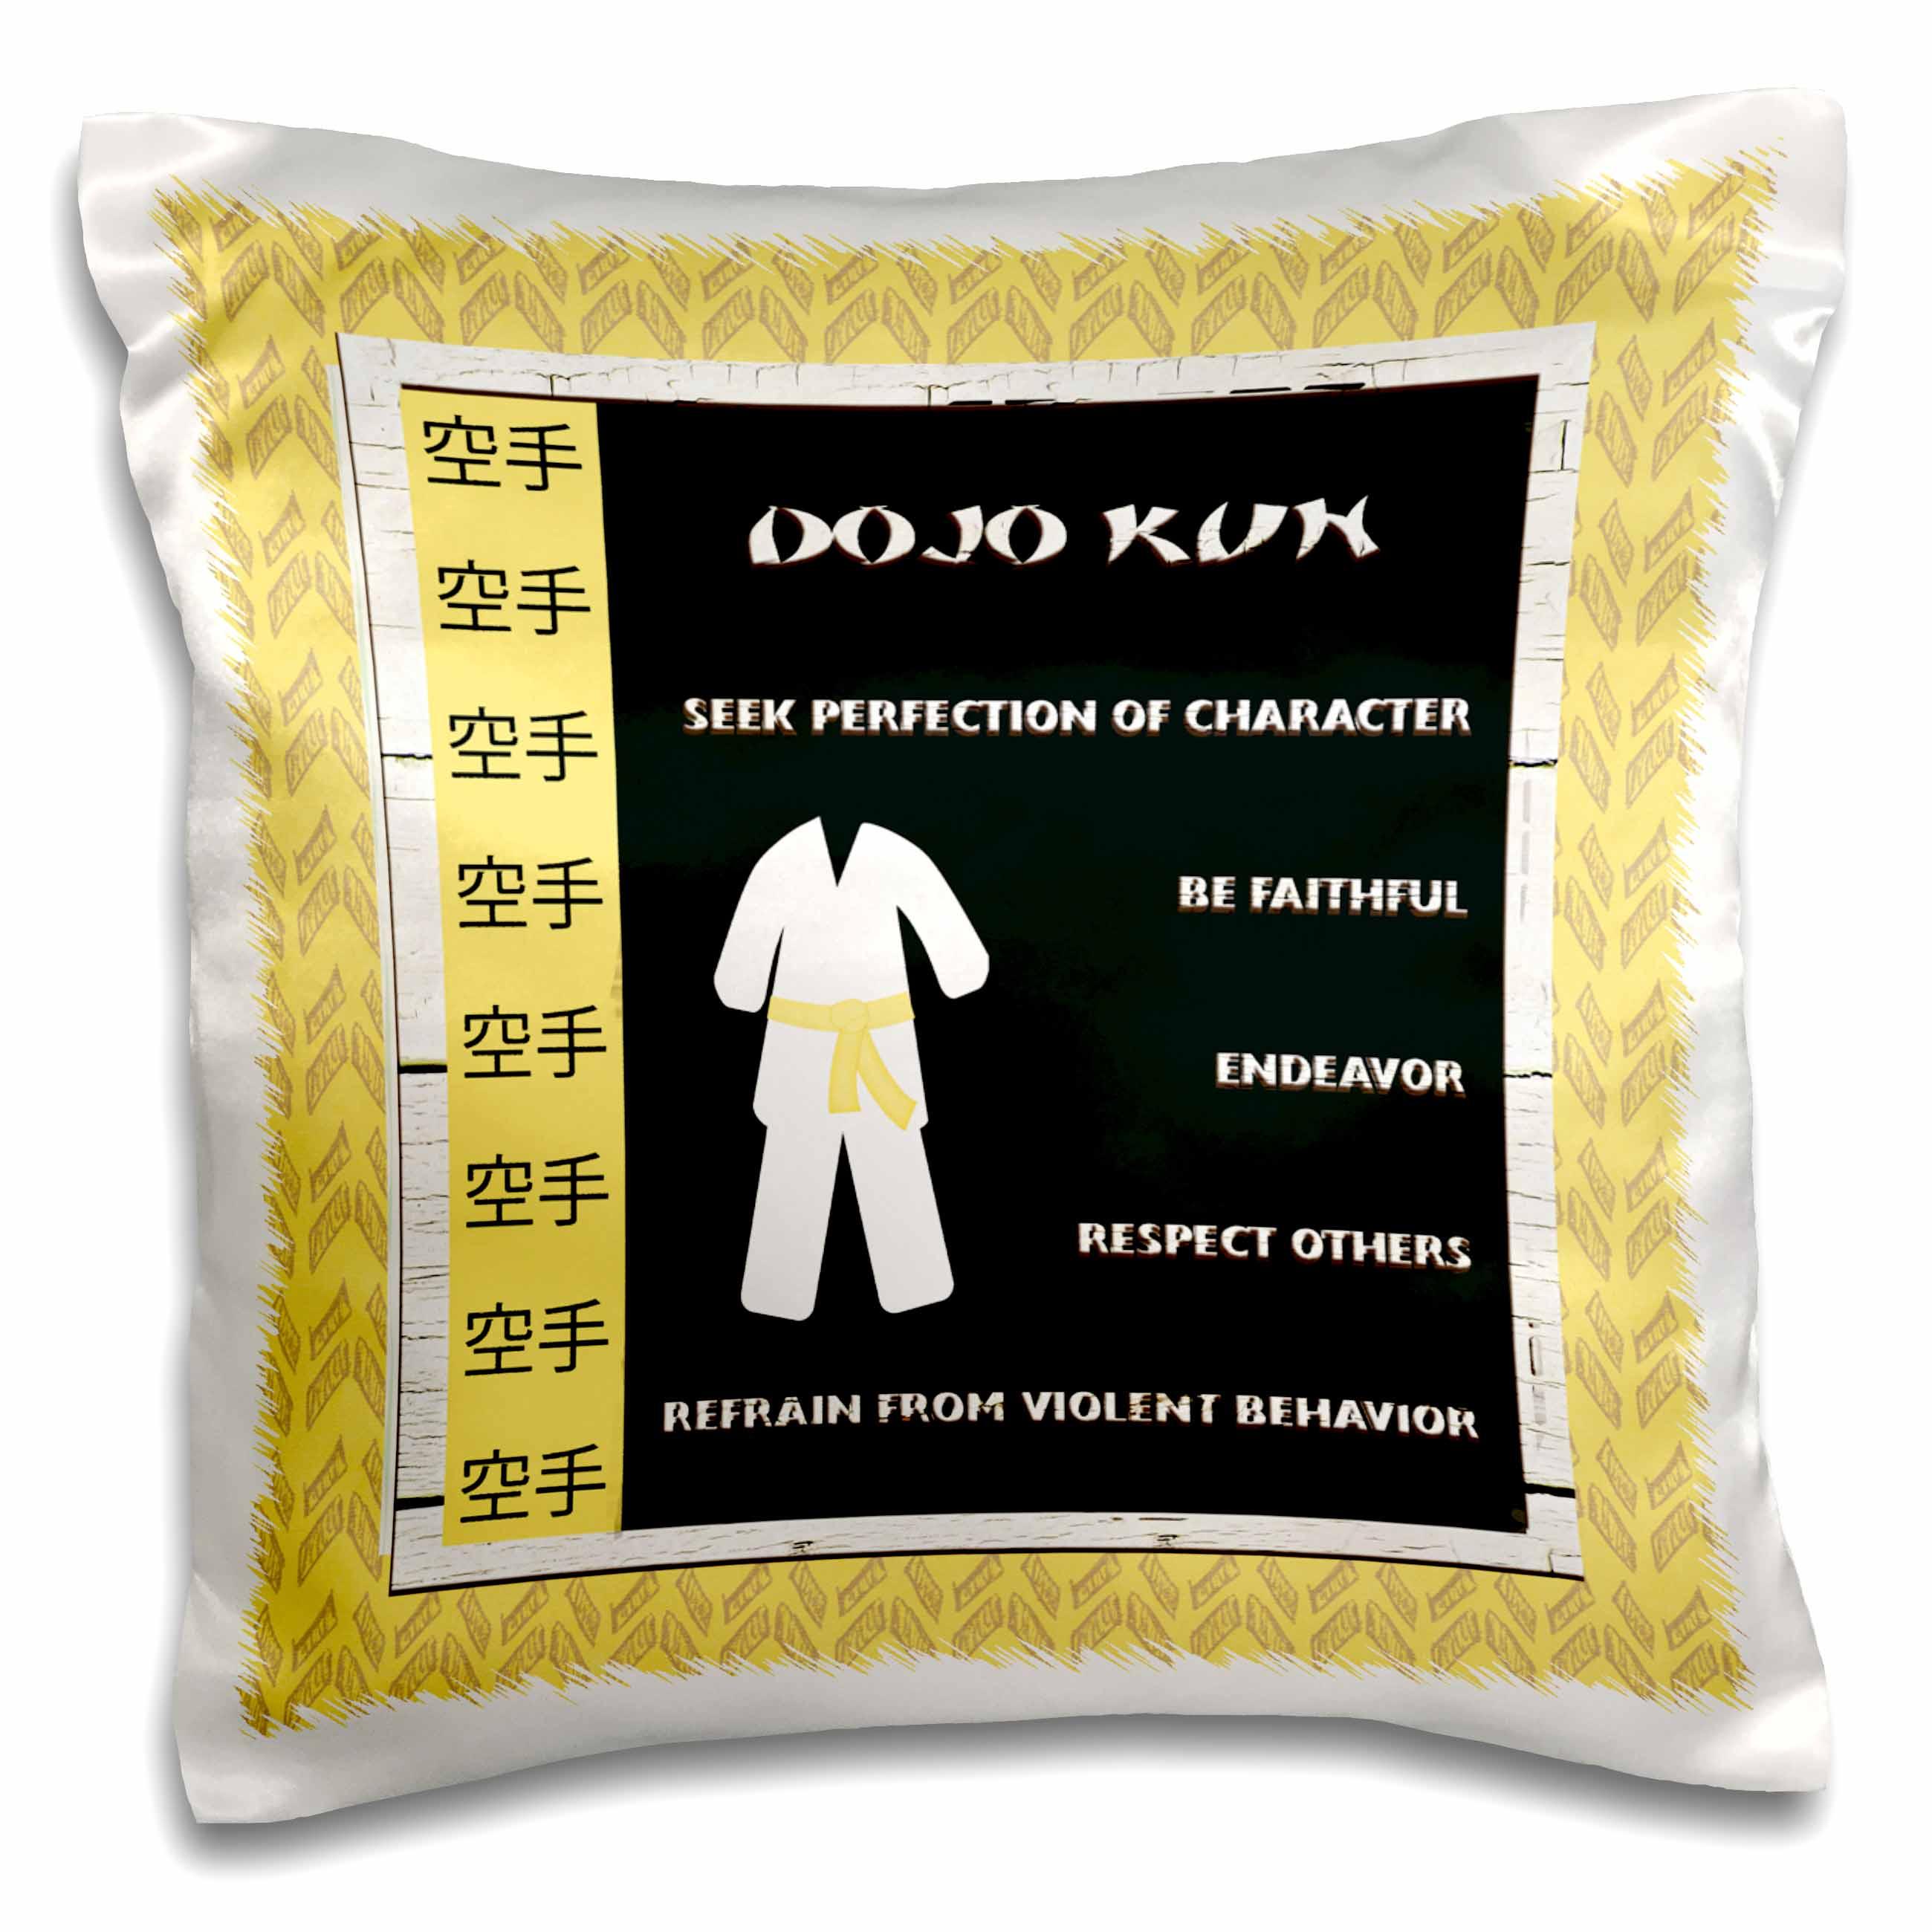 3dRose DoJo Kun, Japanese Martial Arts, Karate Rules, Yellow Belt, Pillow Case, 16 by 16-inch